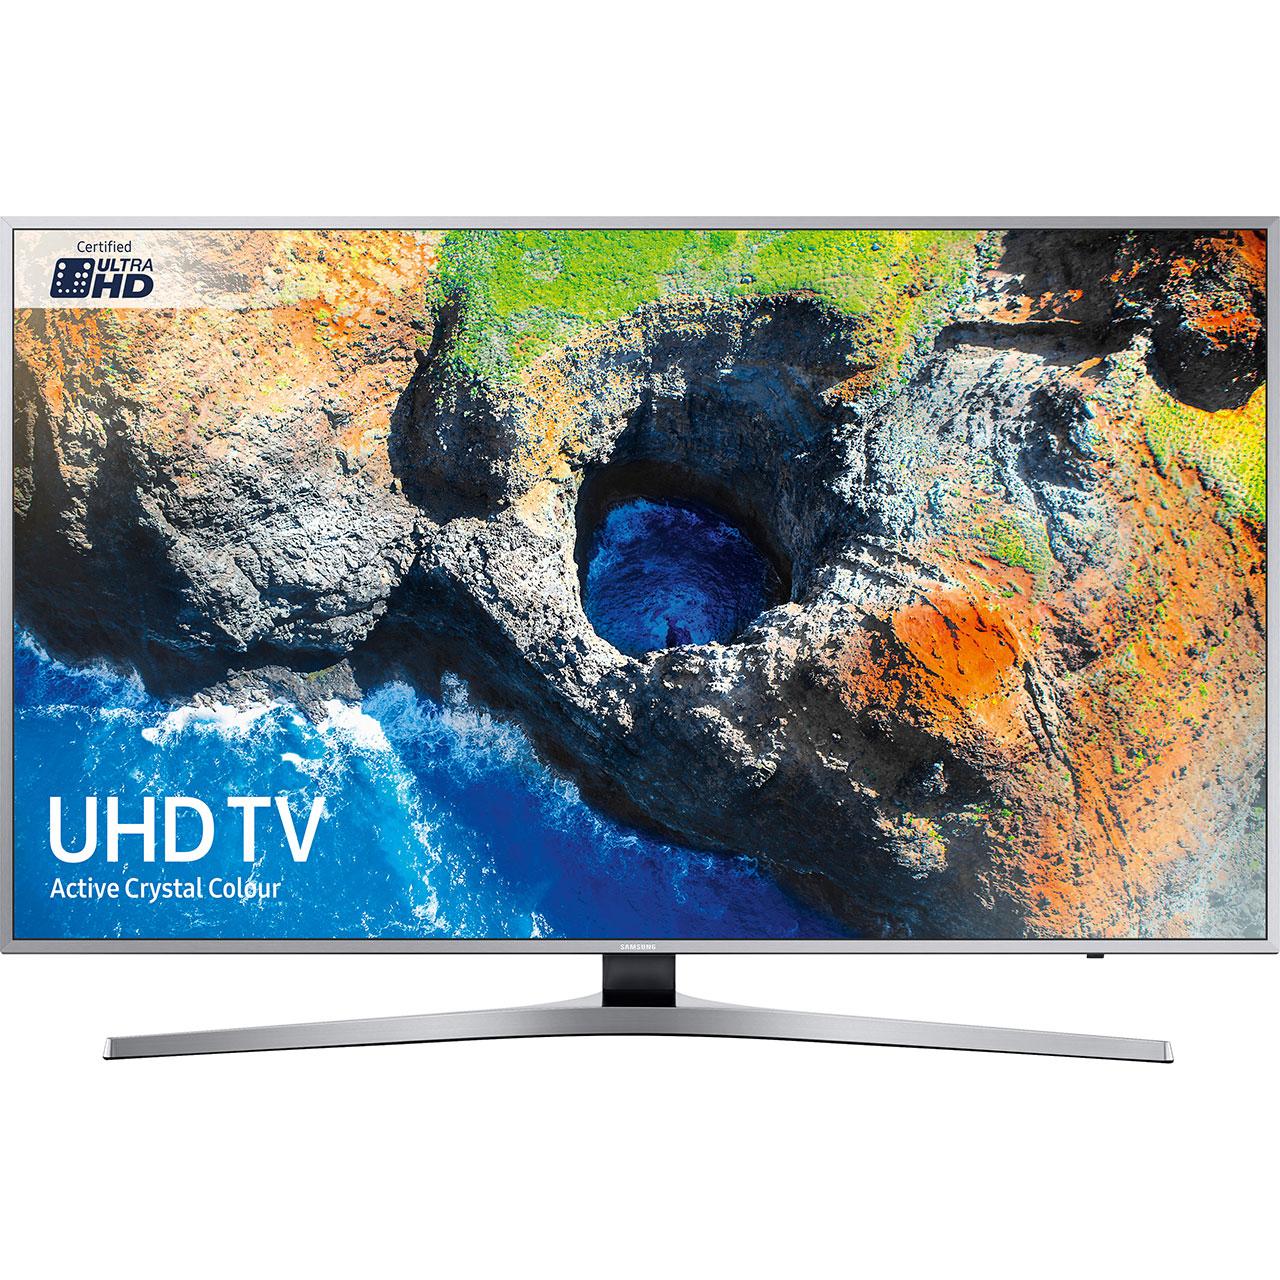 "Samsung UE40MU6400 40"" Smart 4K HDR TV -Silver ( 6 Payments of £71.50 % APR ) £429 @ AO.com"